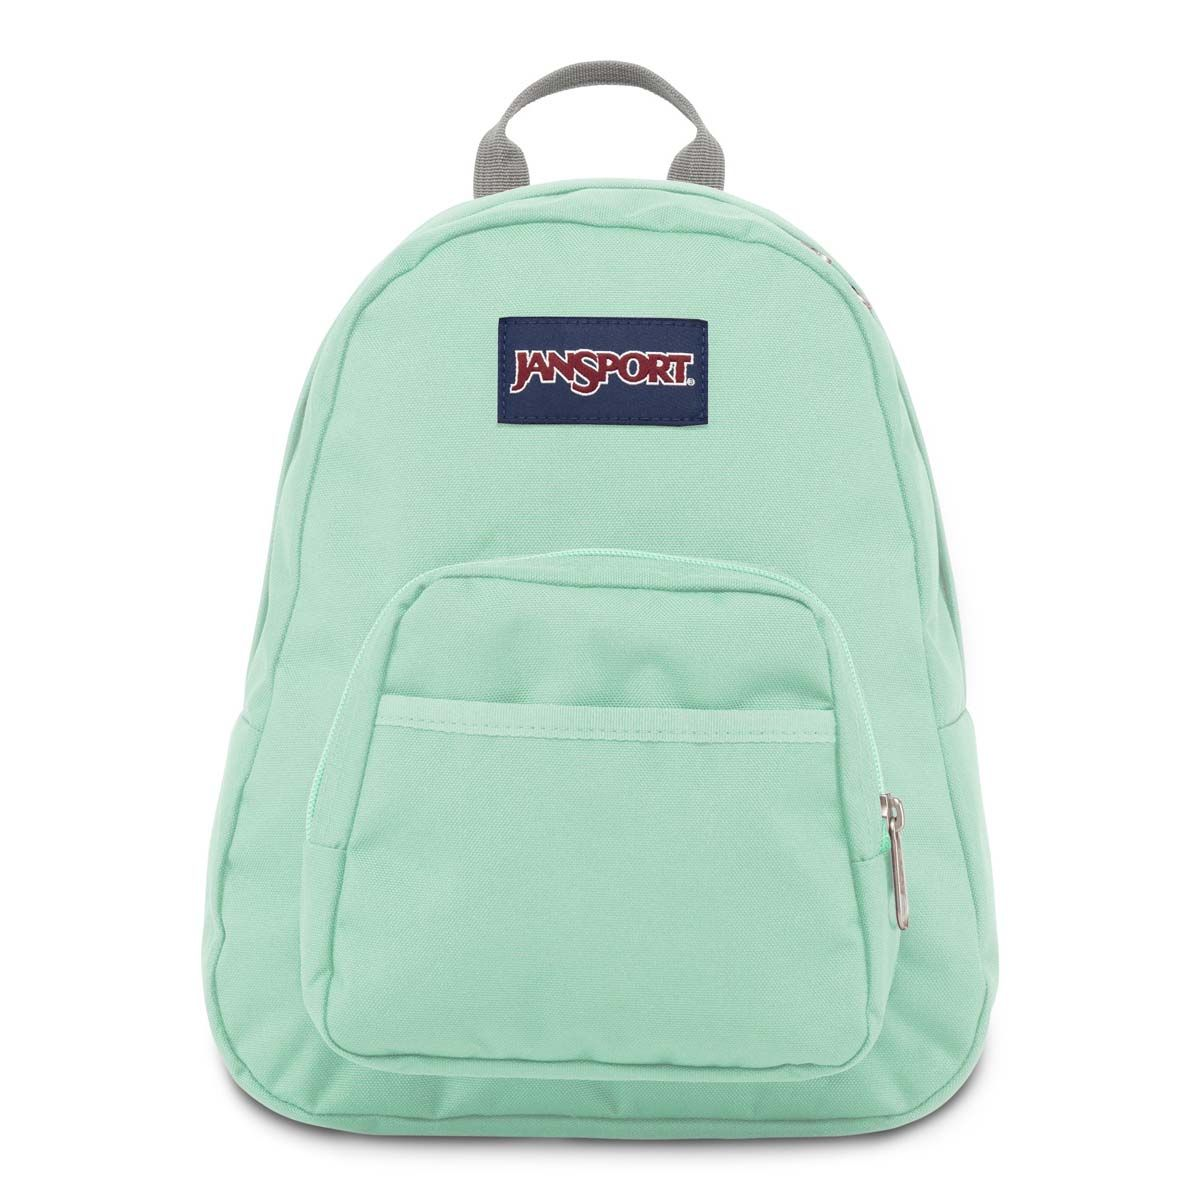 JanSport Half Pint Mini Backpack in Brook Green